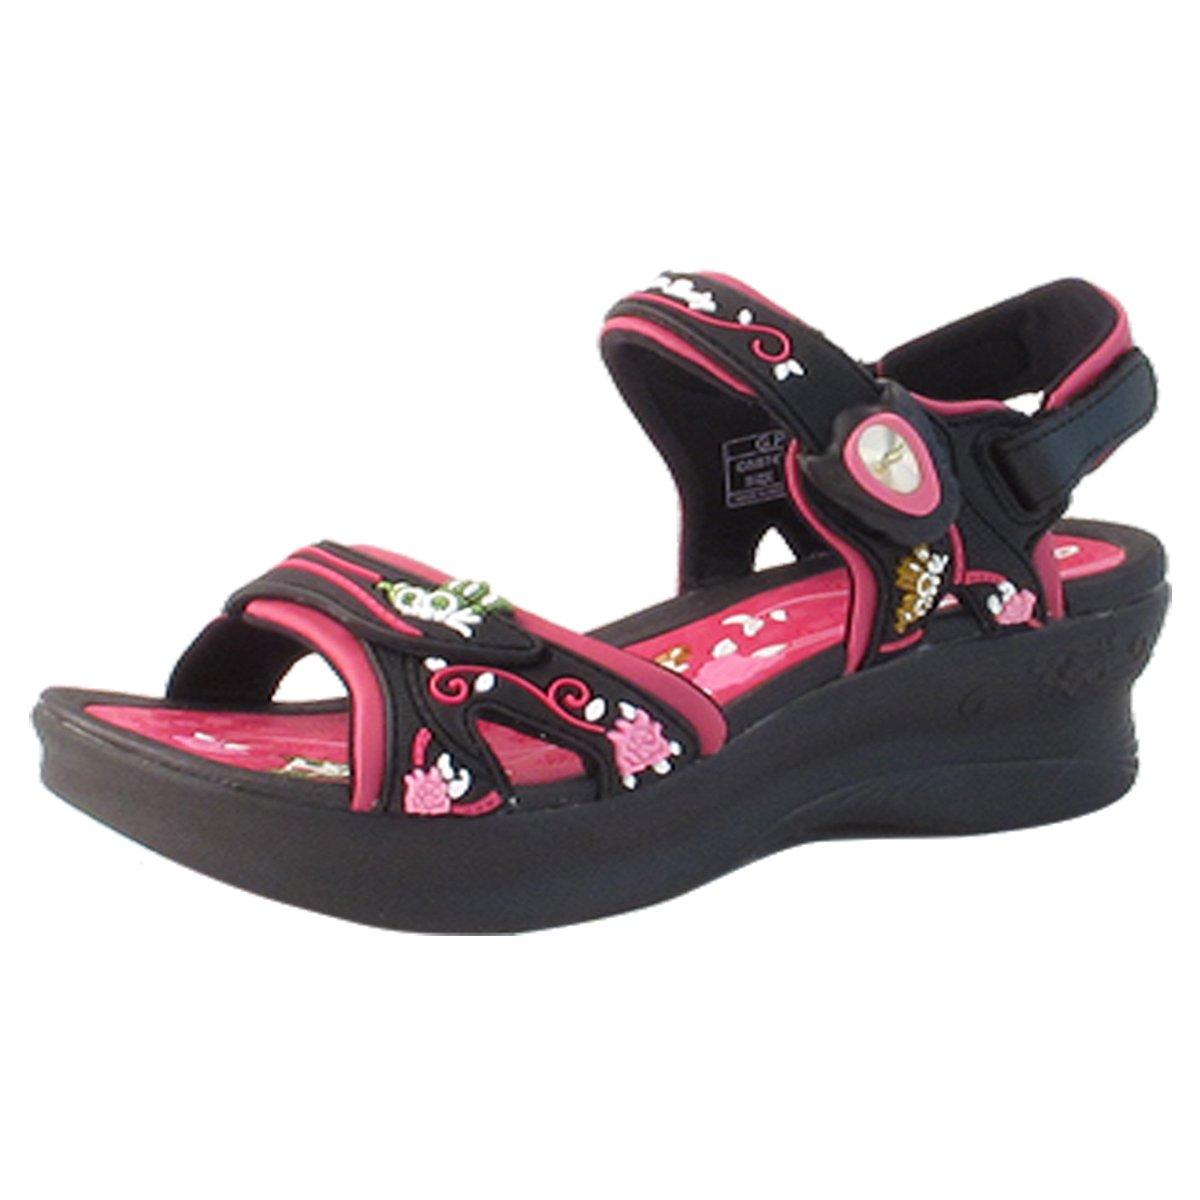 Gold Pigeon GP5974W (Size 4.5-8) Easy Magnetic Snap Lock Closure Light Weight Comfort Platform Sandals (Size 4.5-8) B06XX7H1QQ EU38: US 7|Black Fuchsia